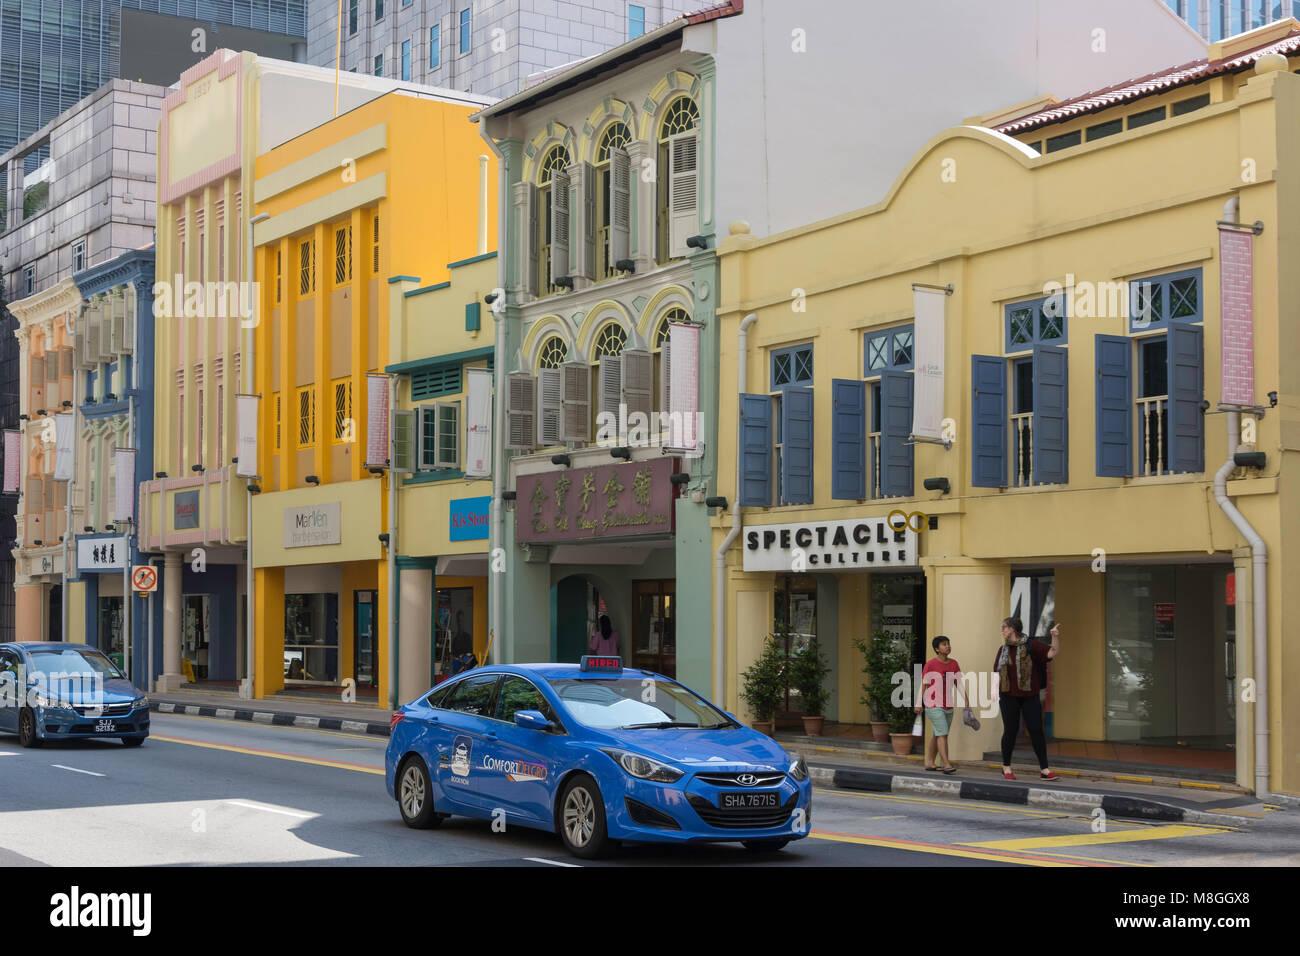 Shophouses on South Bridge Road, Chinatown, Outram District, Central Area, Singapore Island (Pulau Ujong), Singapore - Stock Image